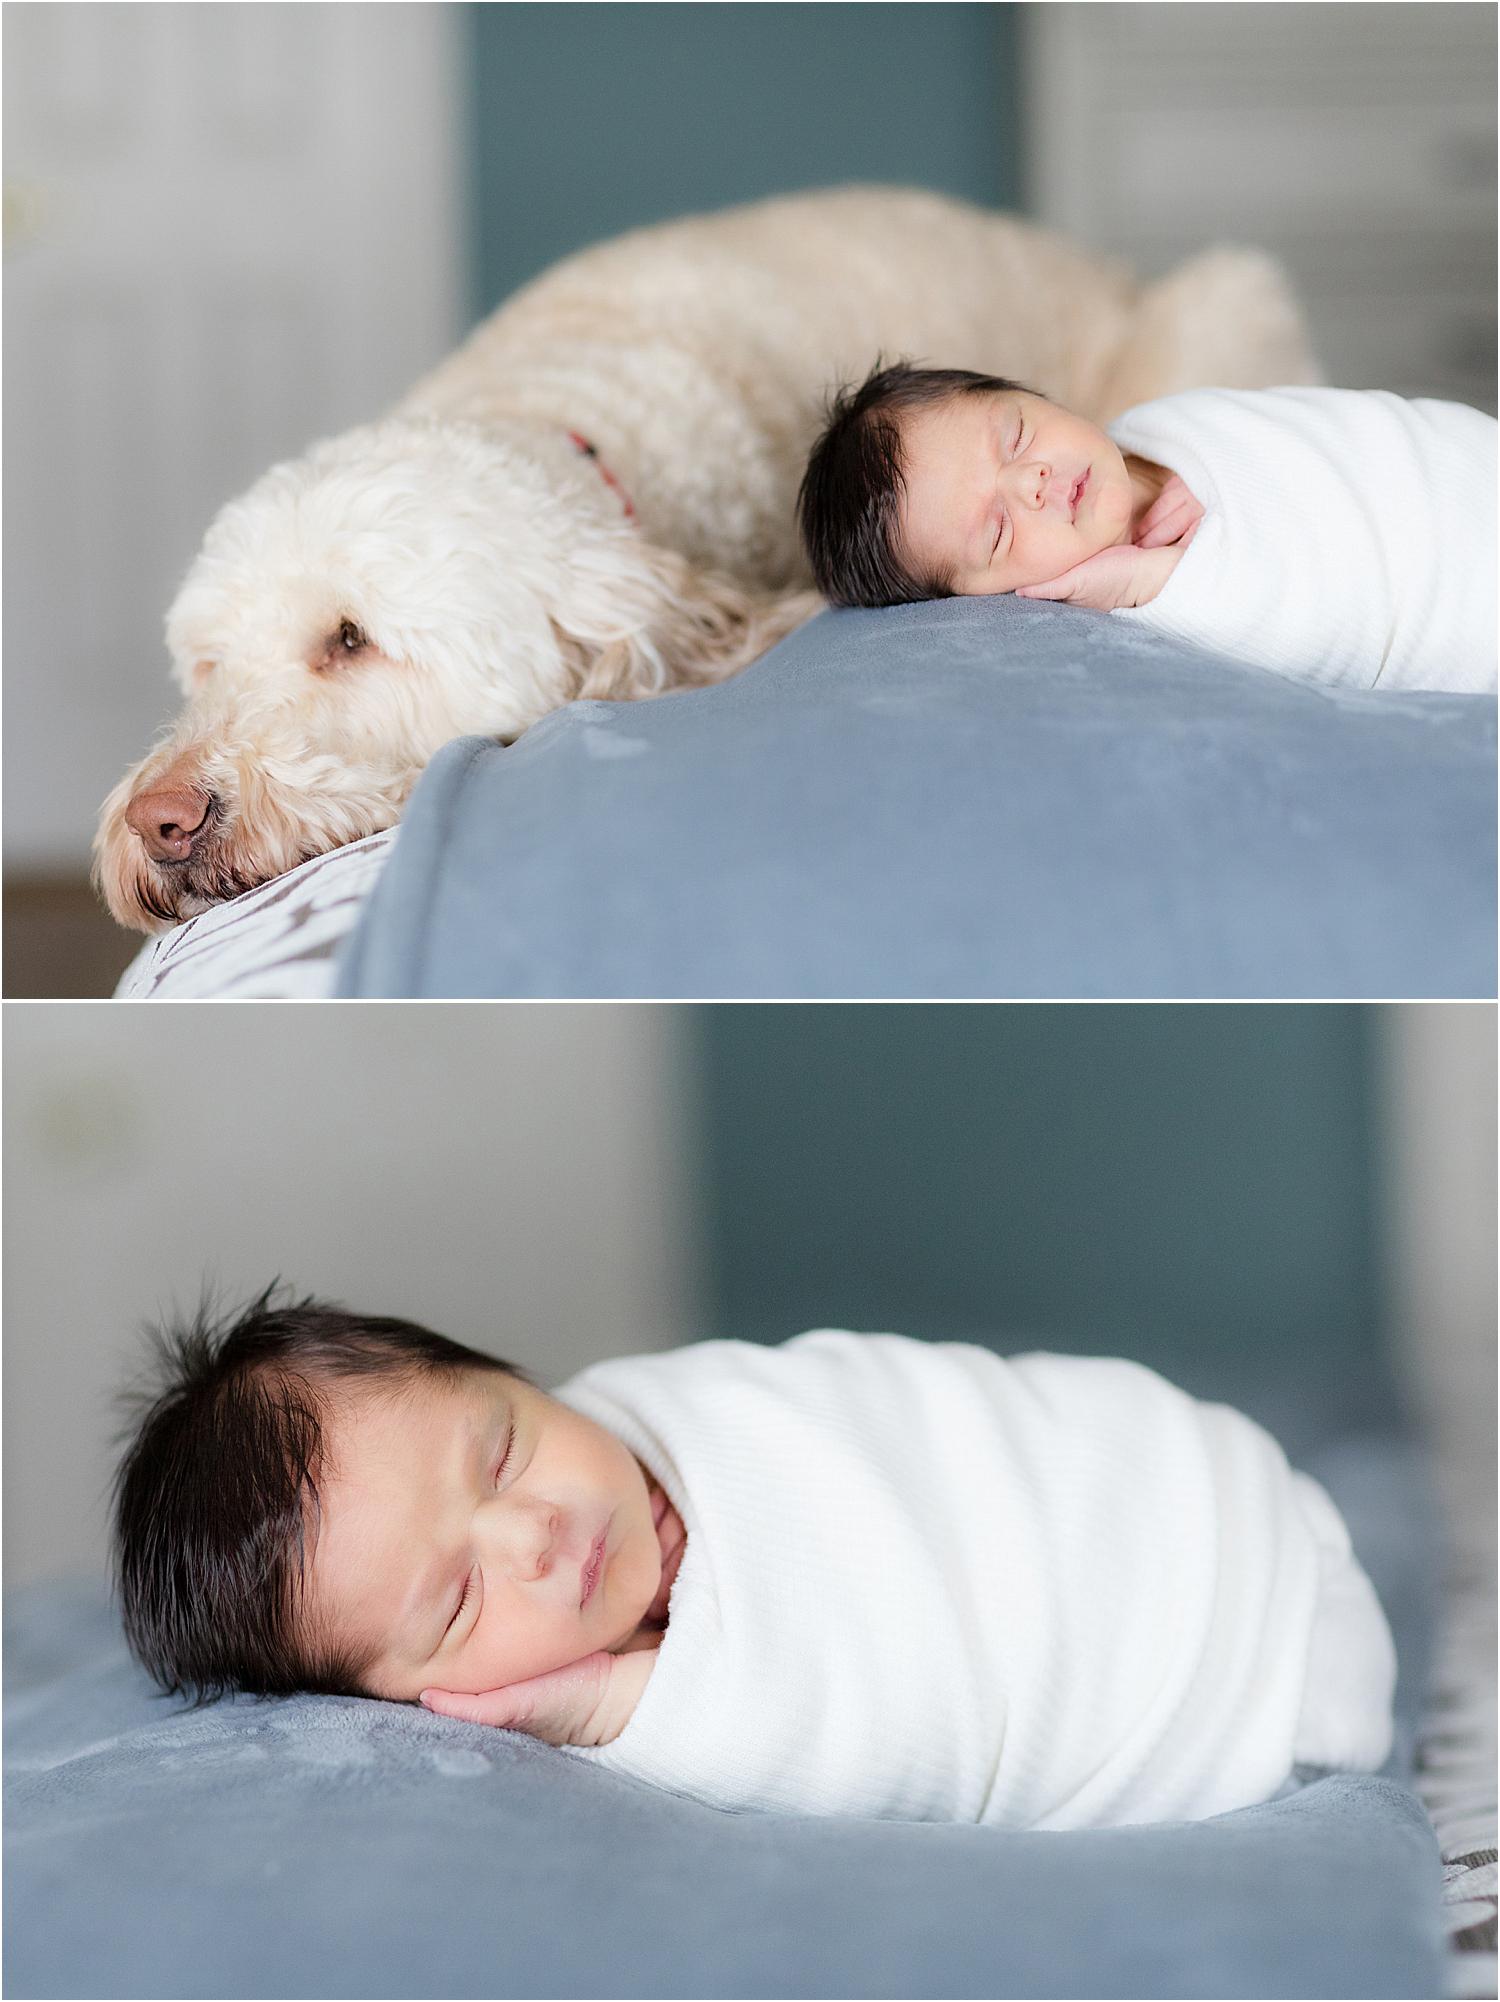 newborn-boy-on-bed-with-dog